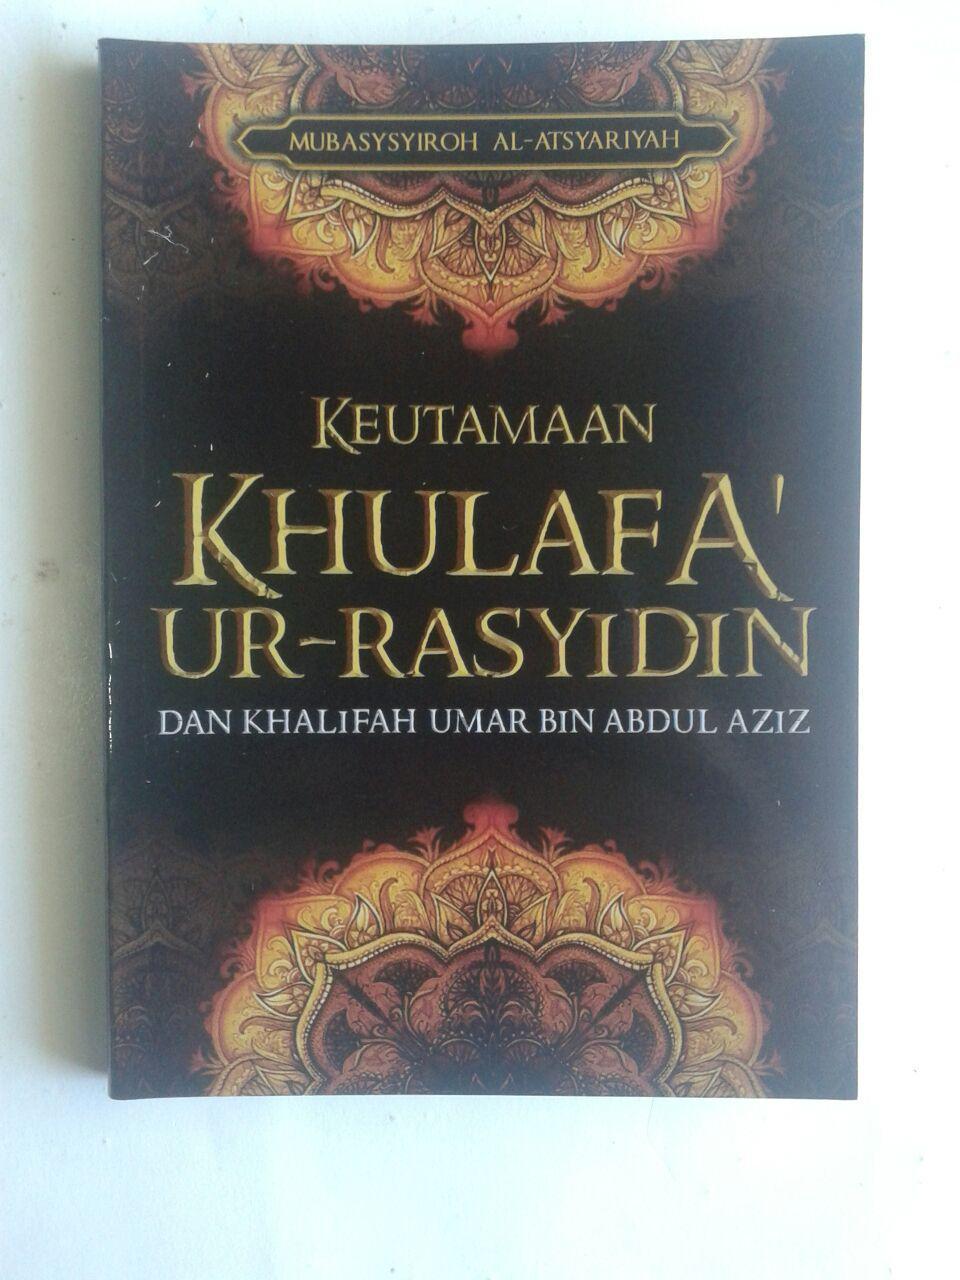 Buku Saku Keutamaan Khulafaur Rasyidin Dan Umar bin Abdul Aziz cover 2